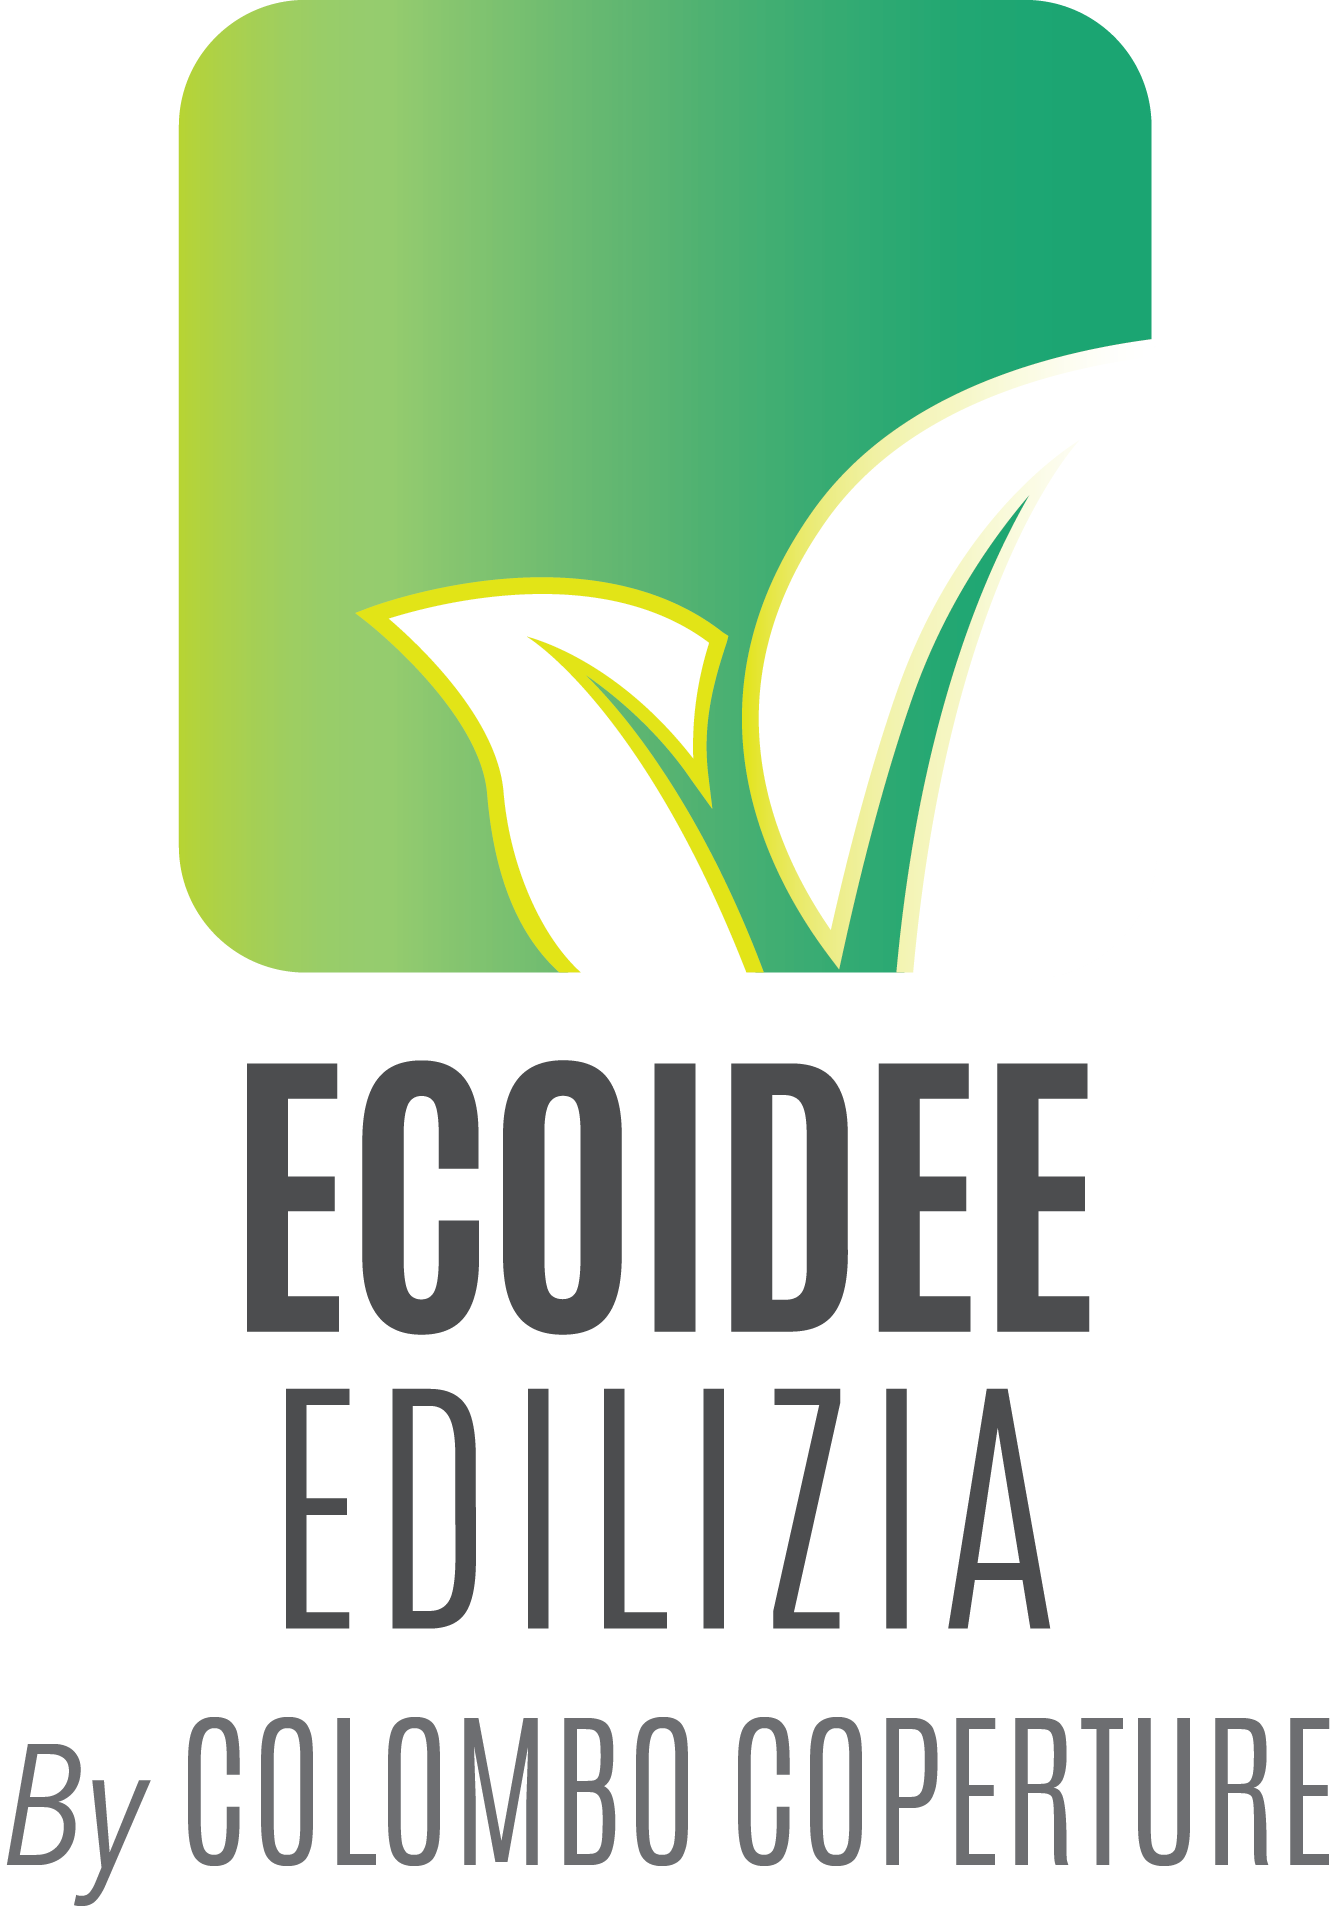 Logo Ecoidee Edilizia